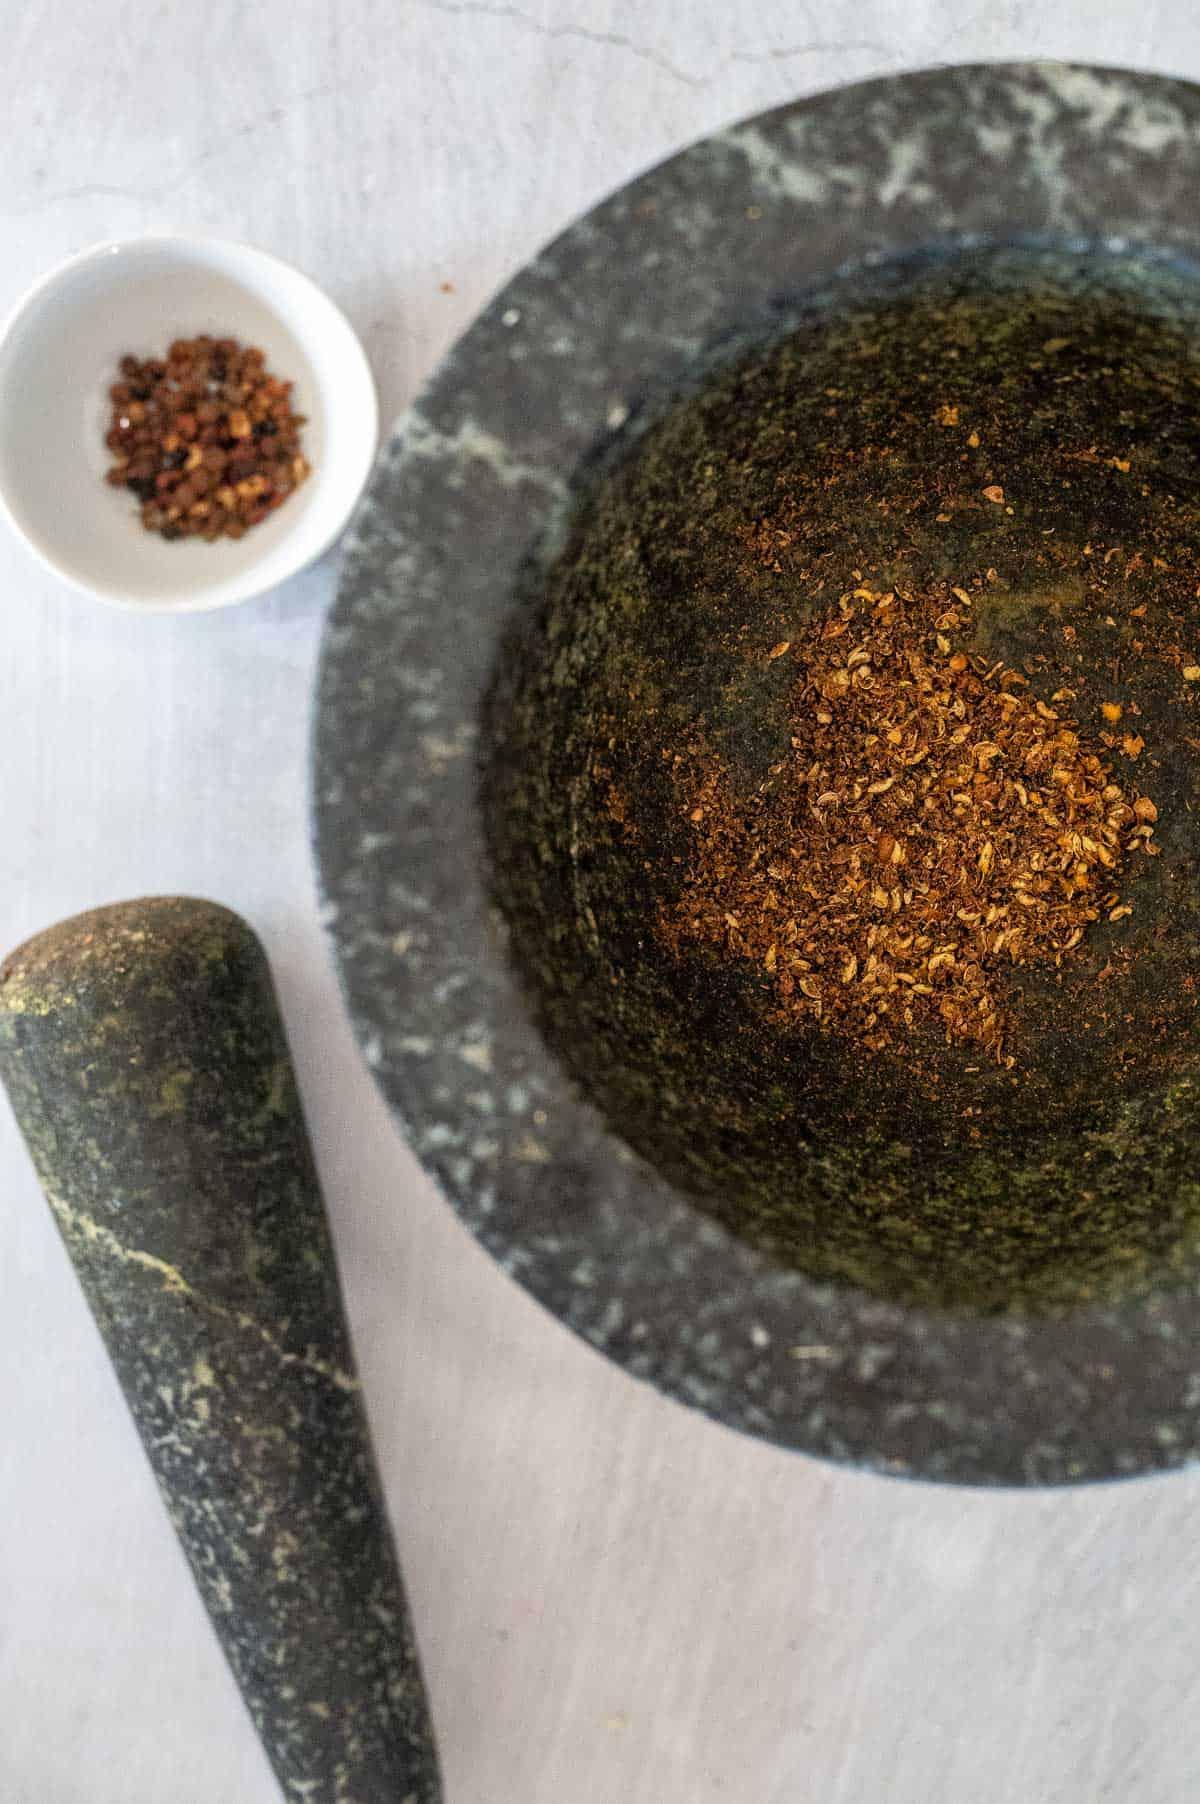 Grinding szechuan peppercorns in a mortar and pestle